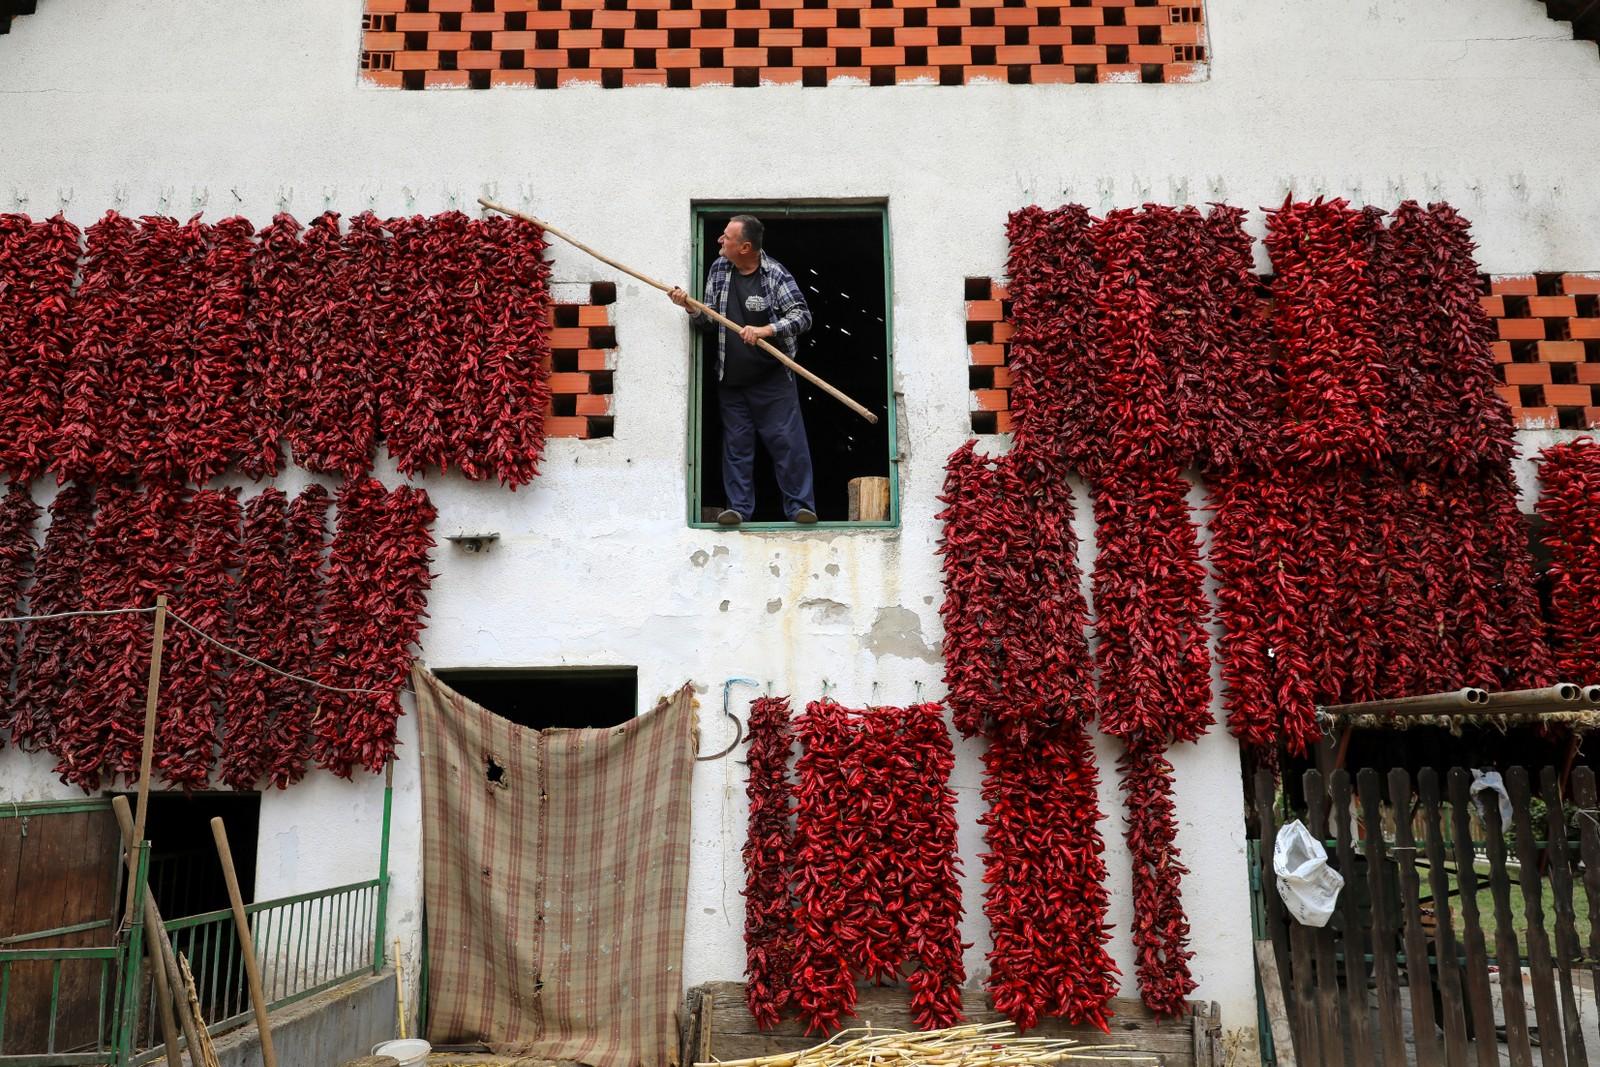 Her tørkes chili på veggen i landsbyen Donja Lakošnica i Serbia.